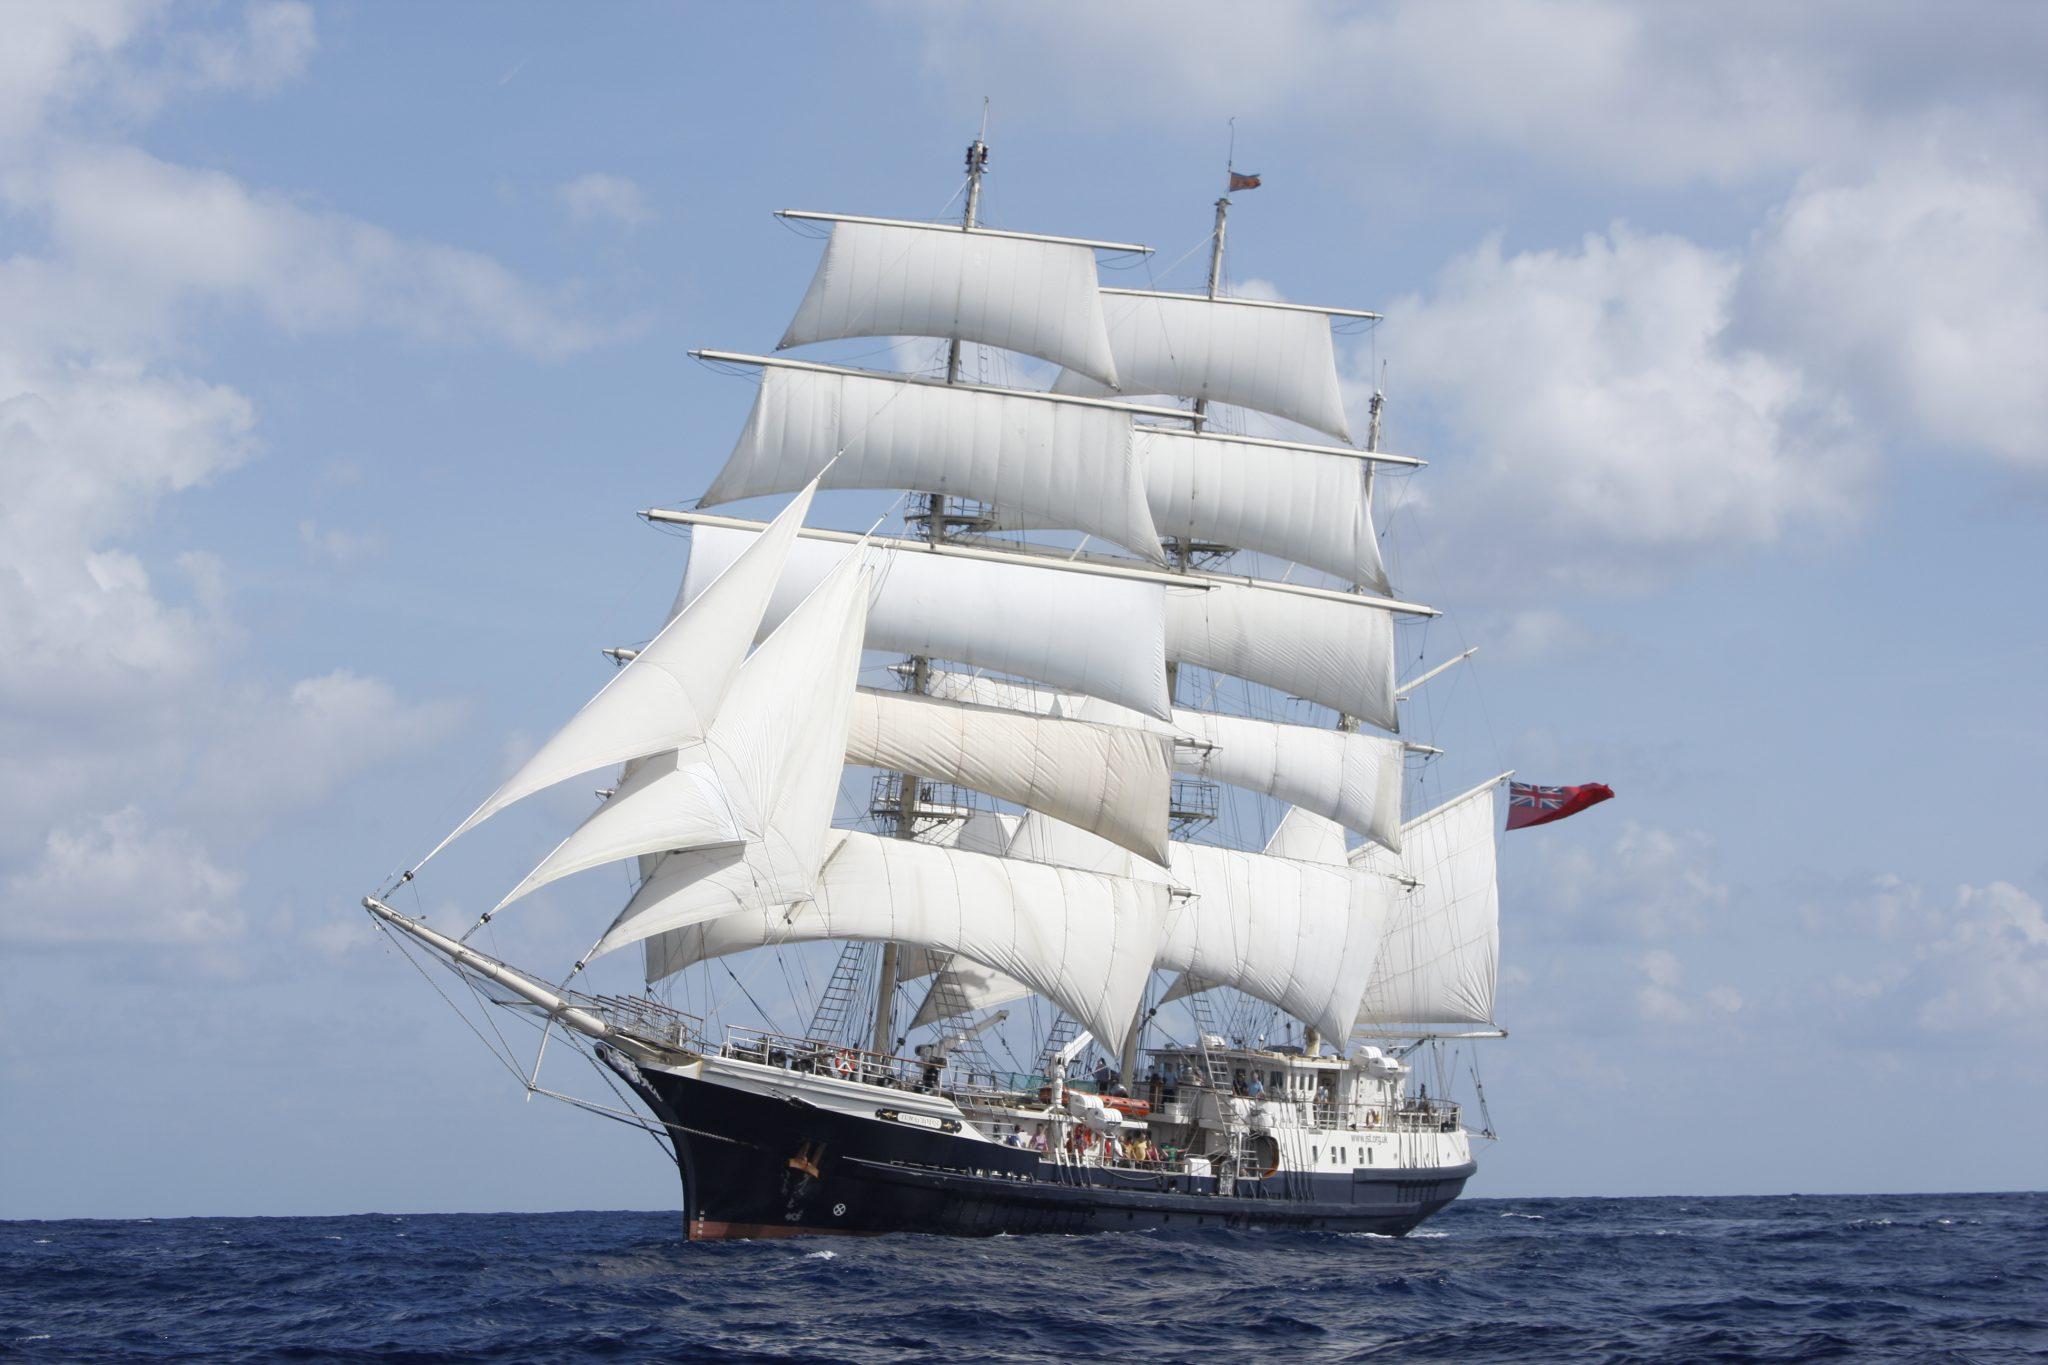 Tenacious-Jubilee Sailing Trust